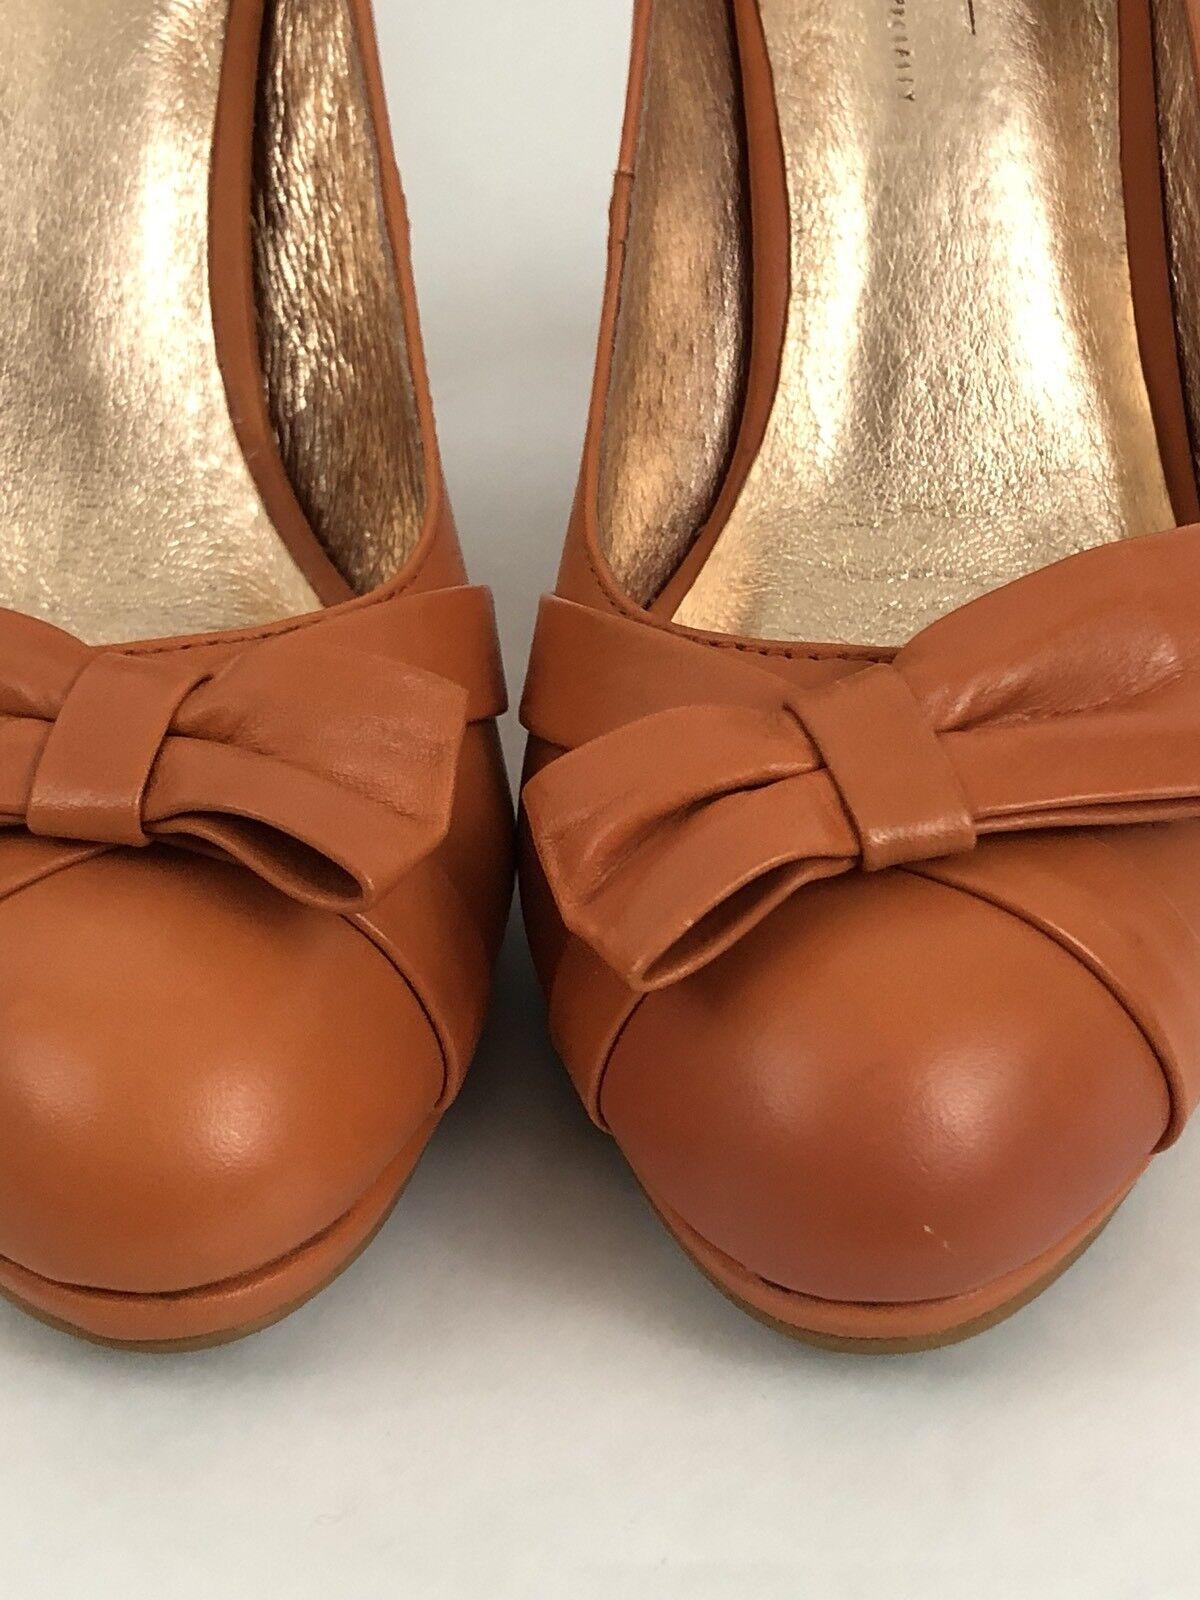 Anthropologie MIss Leather Albright Women Platform Heels Orange Leather MIss Bow Size 7.5 a3b39c